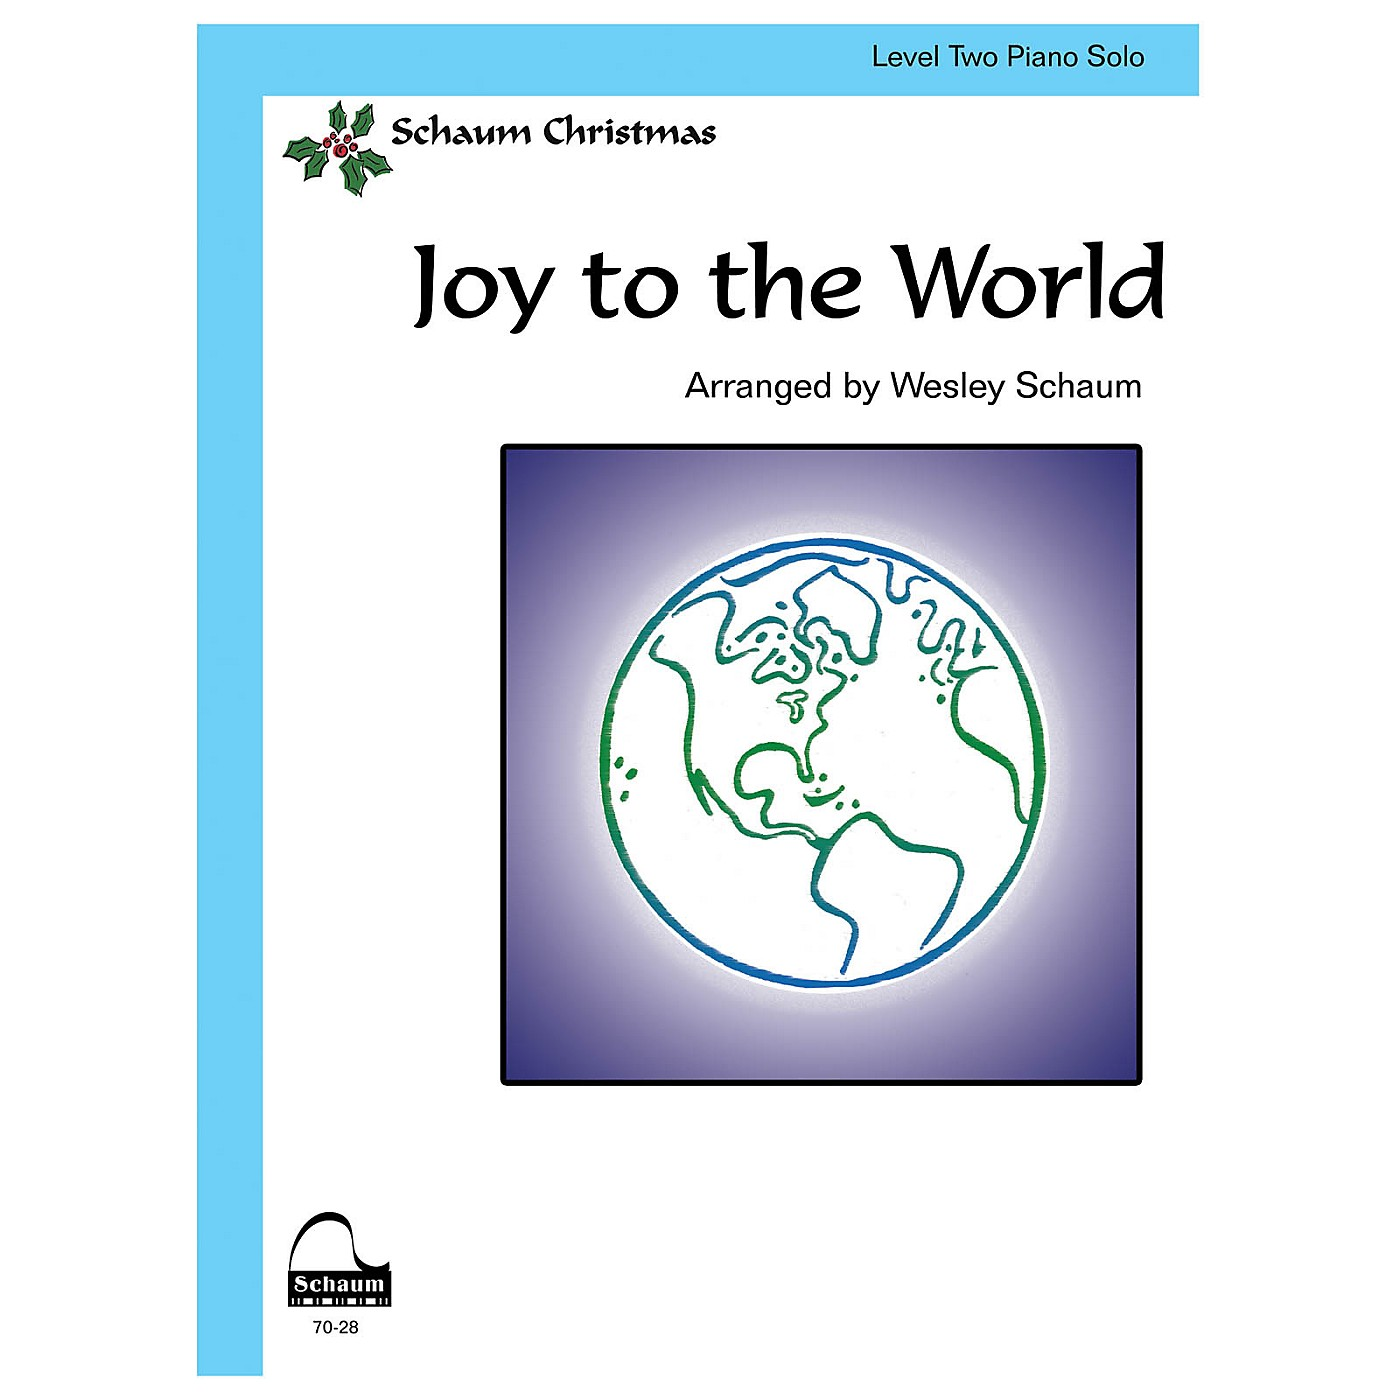 SCHAUM Joy to the World Educational Piano Book by George Fredrick Handel (Level Late Elem) thumbnail